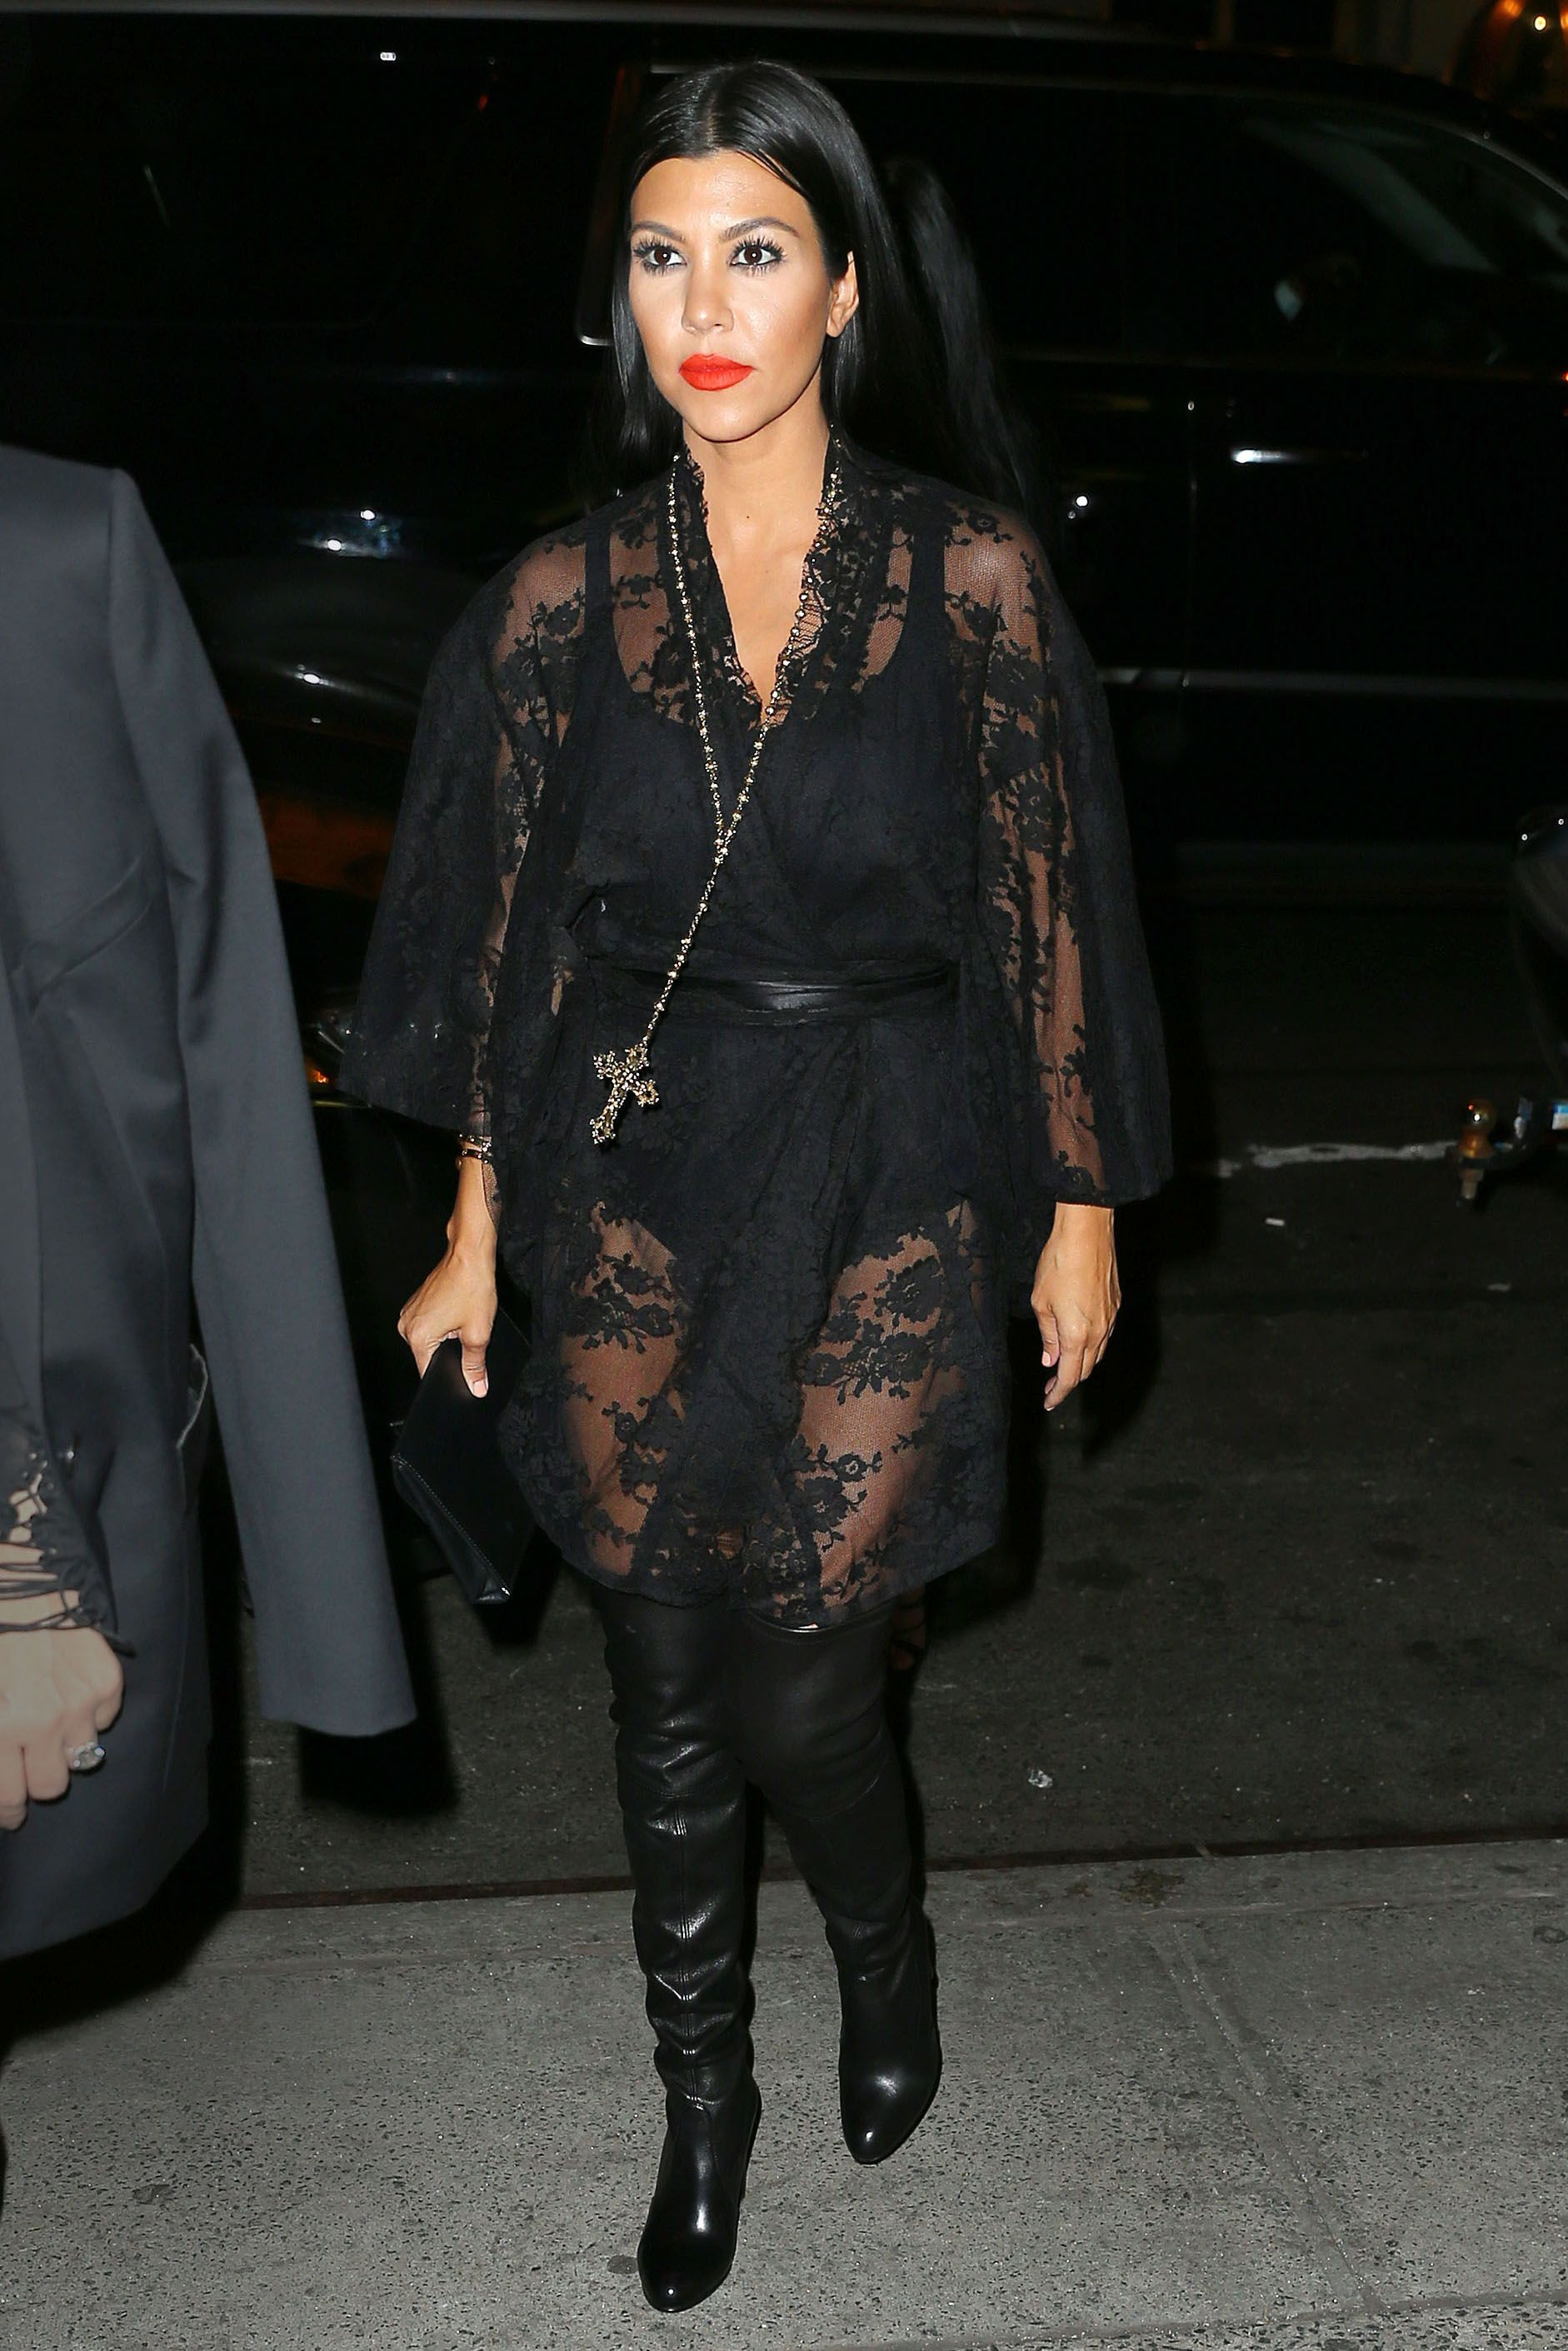 Kourtney Kardashians Transformation Kardashian Through Korean Style Blus With Necklace Short Sleeve The Years